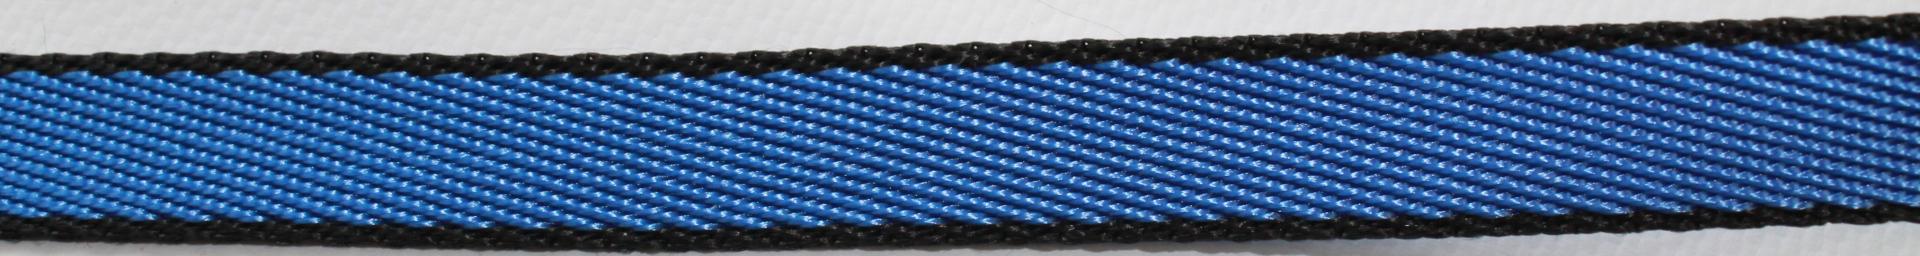 Поводок для собак Happy Friends, цвет: синий, ширина 1 см, длина 2 м поводок для собак happy house luxury цвет темно коричневый длина 125 см